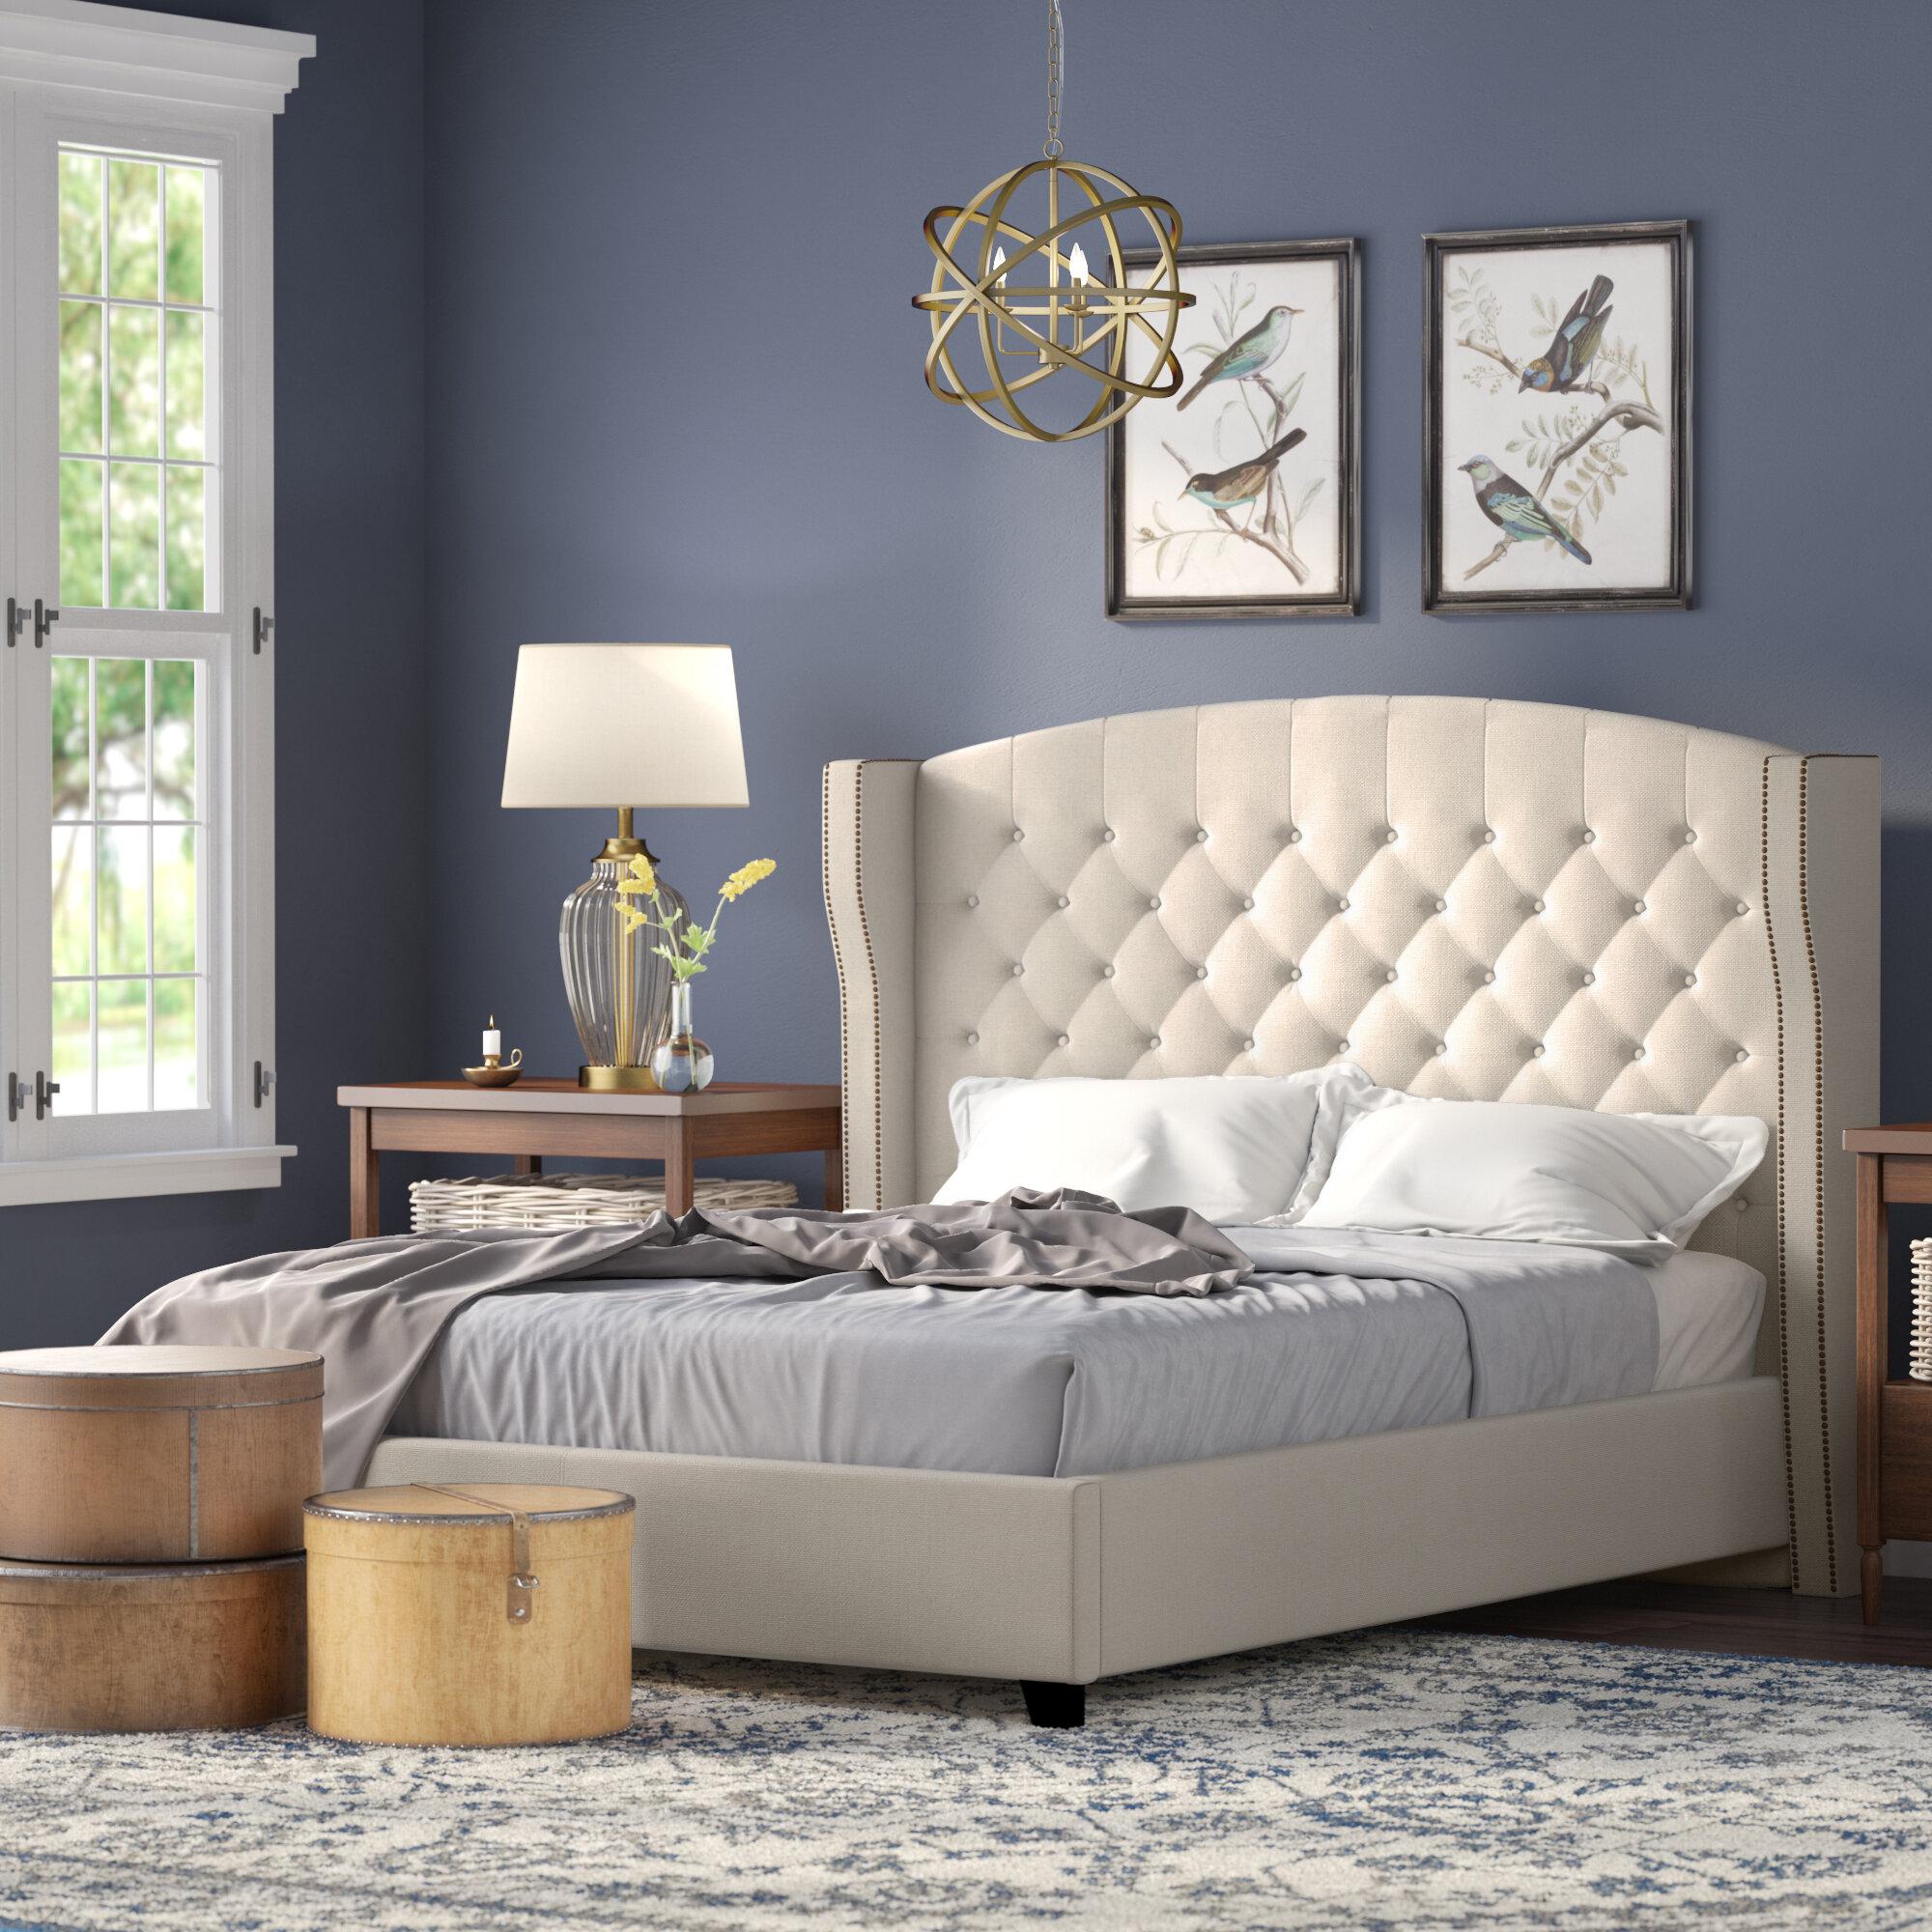 Darby Home Co Arandike Upholstered Platform Bed Reviews Wayfair